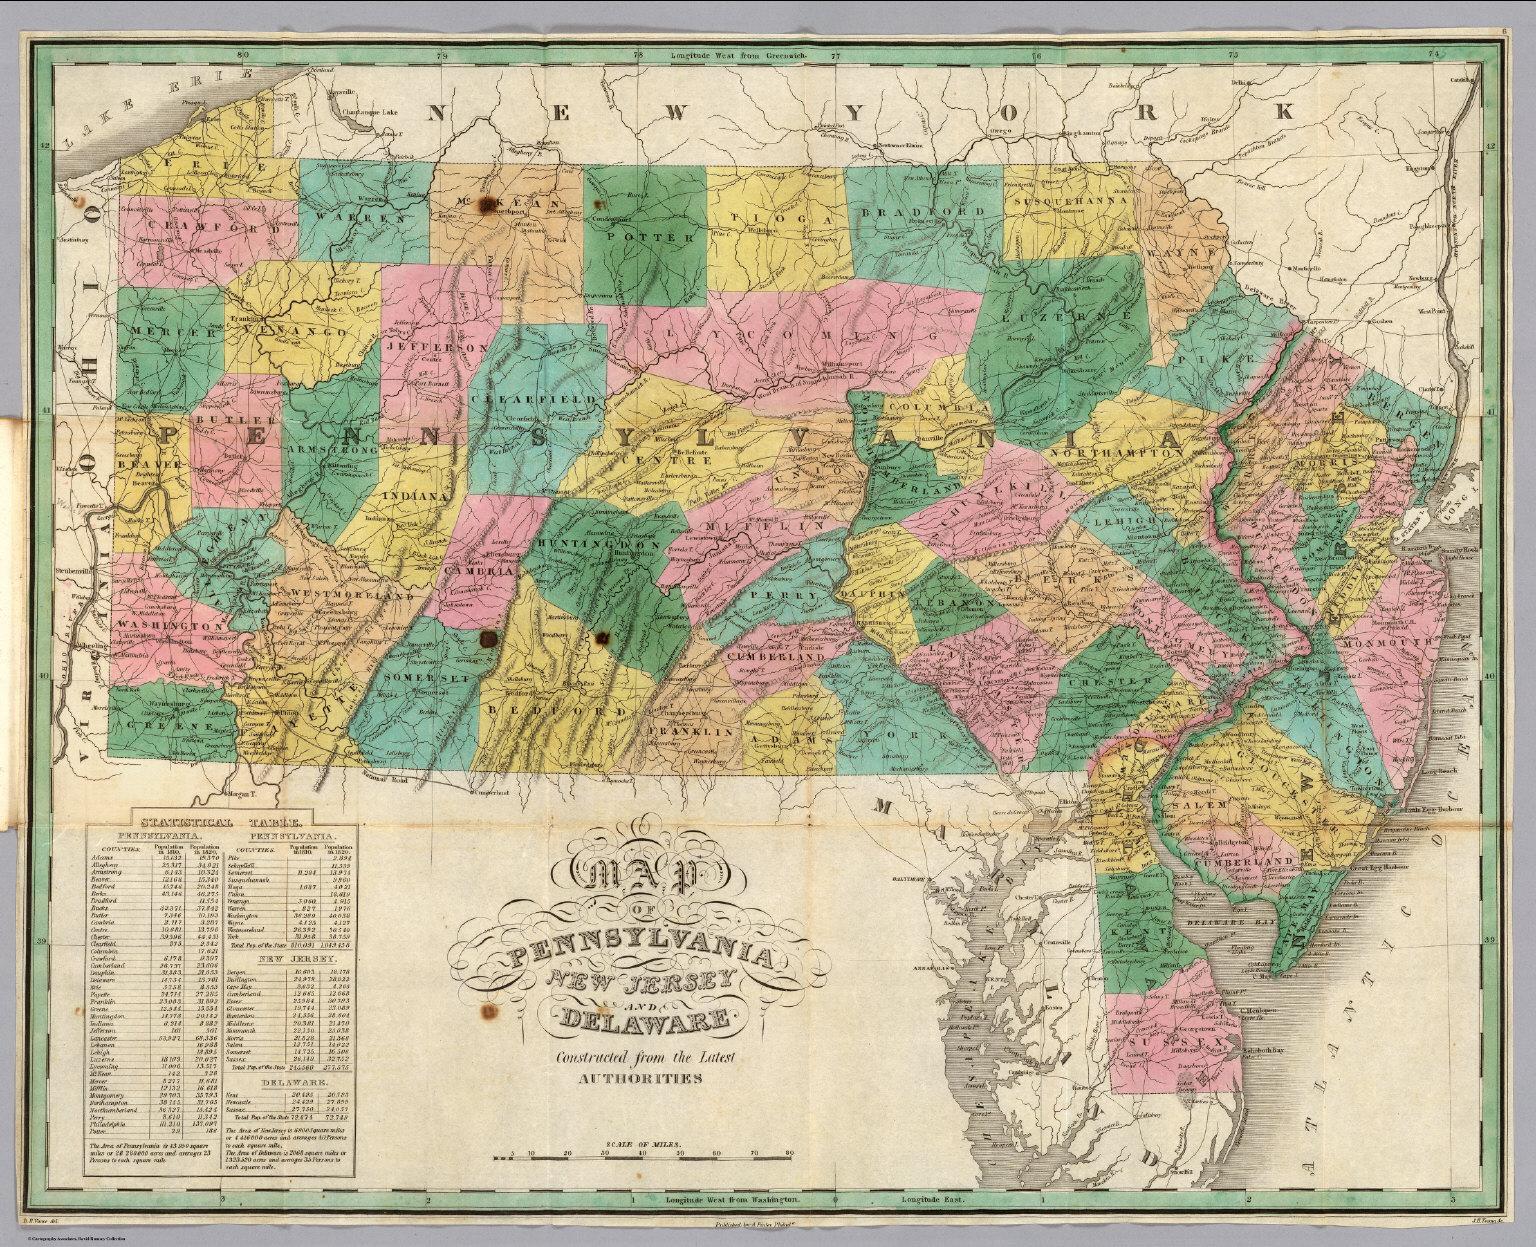 Pennsylvania New Jersey Delaware David Rumsey Historical Map